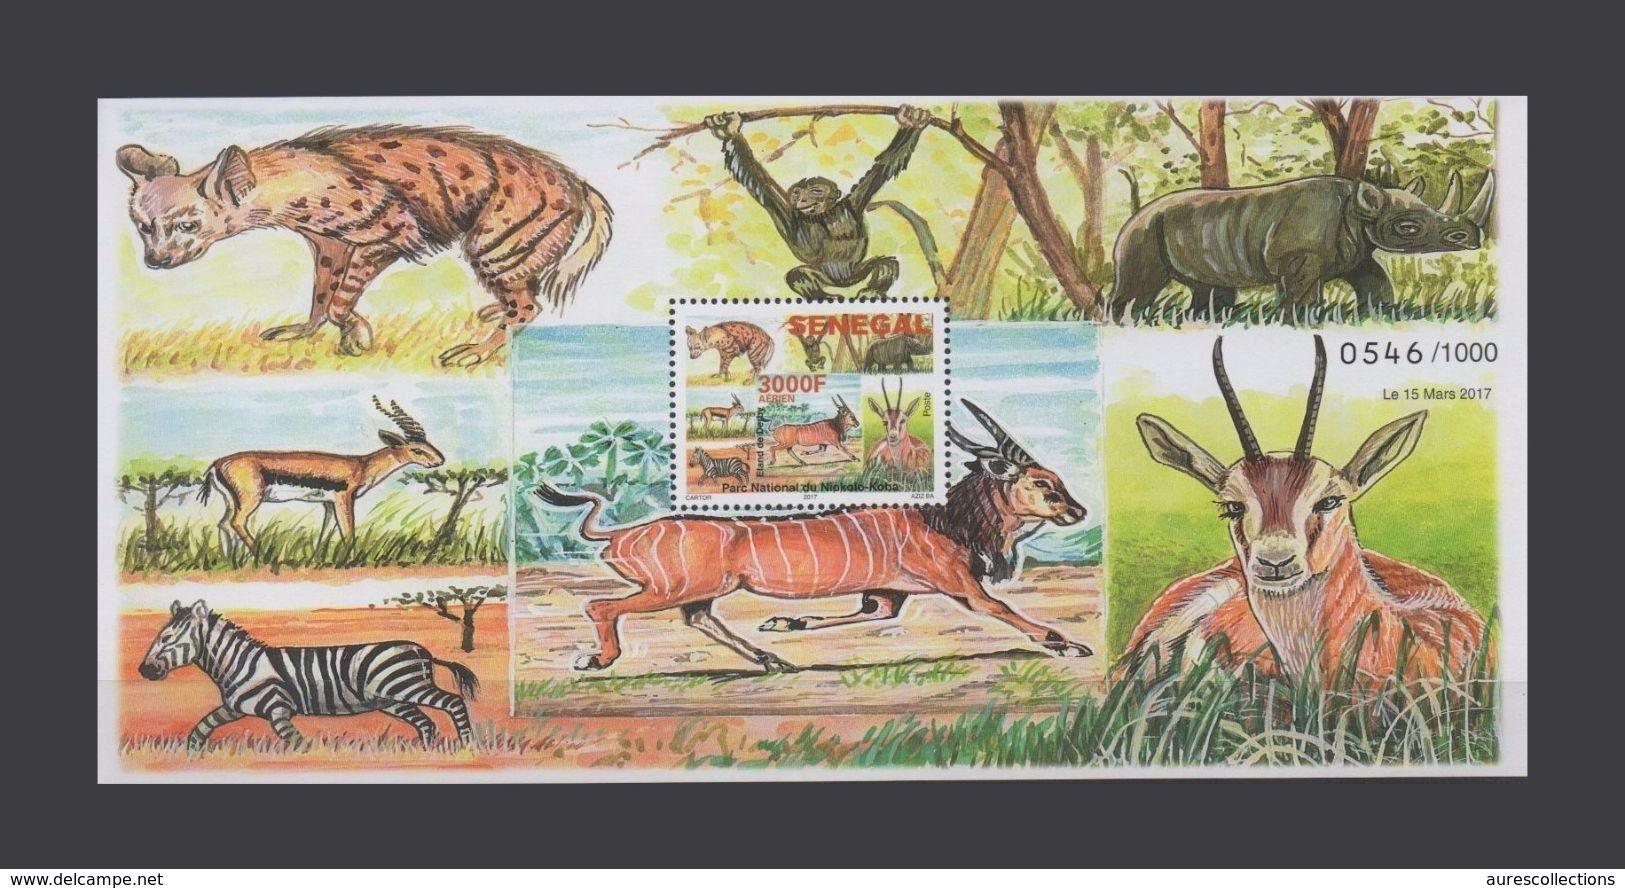 SENEGAL FAUNA ANIMALS NATIONAL PARK MONKEY APE ANTELOPE ZEBRA RHINOCEROS HYENA 2017 S/S SOUVENIR SHEET (ULTRA RARE) MNH - Rhinozerosse